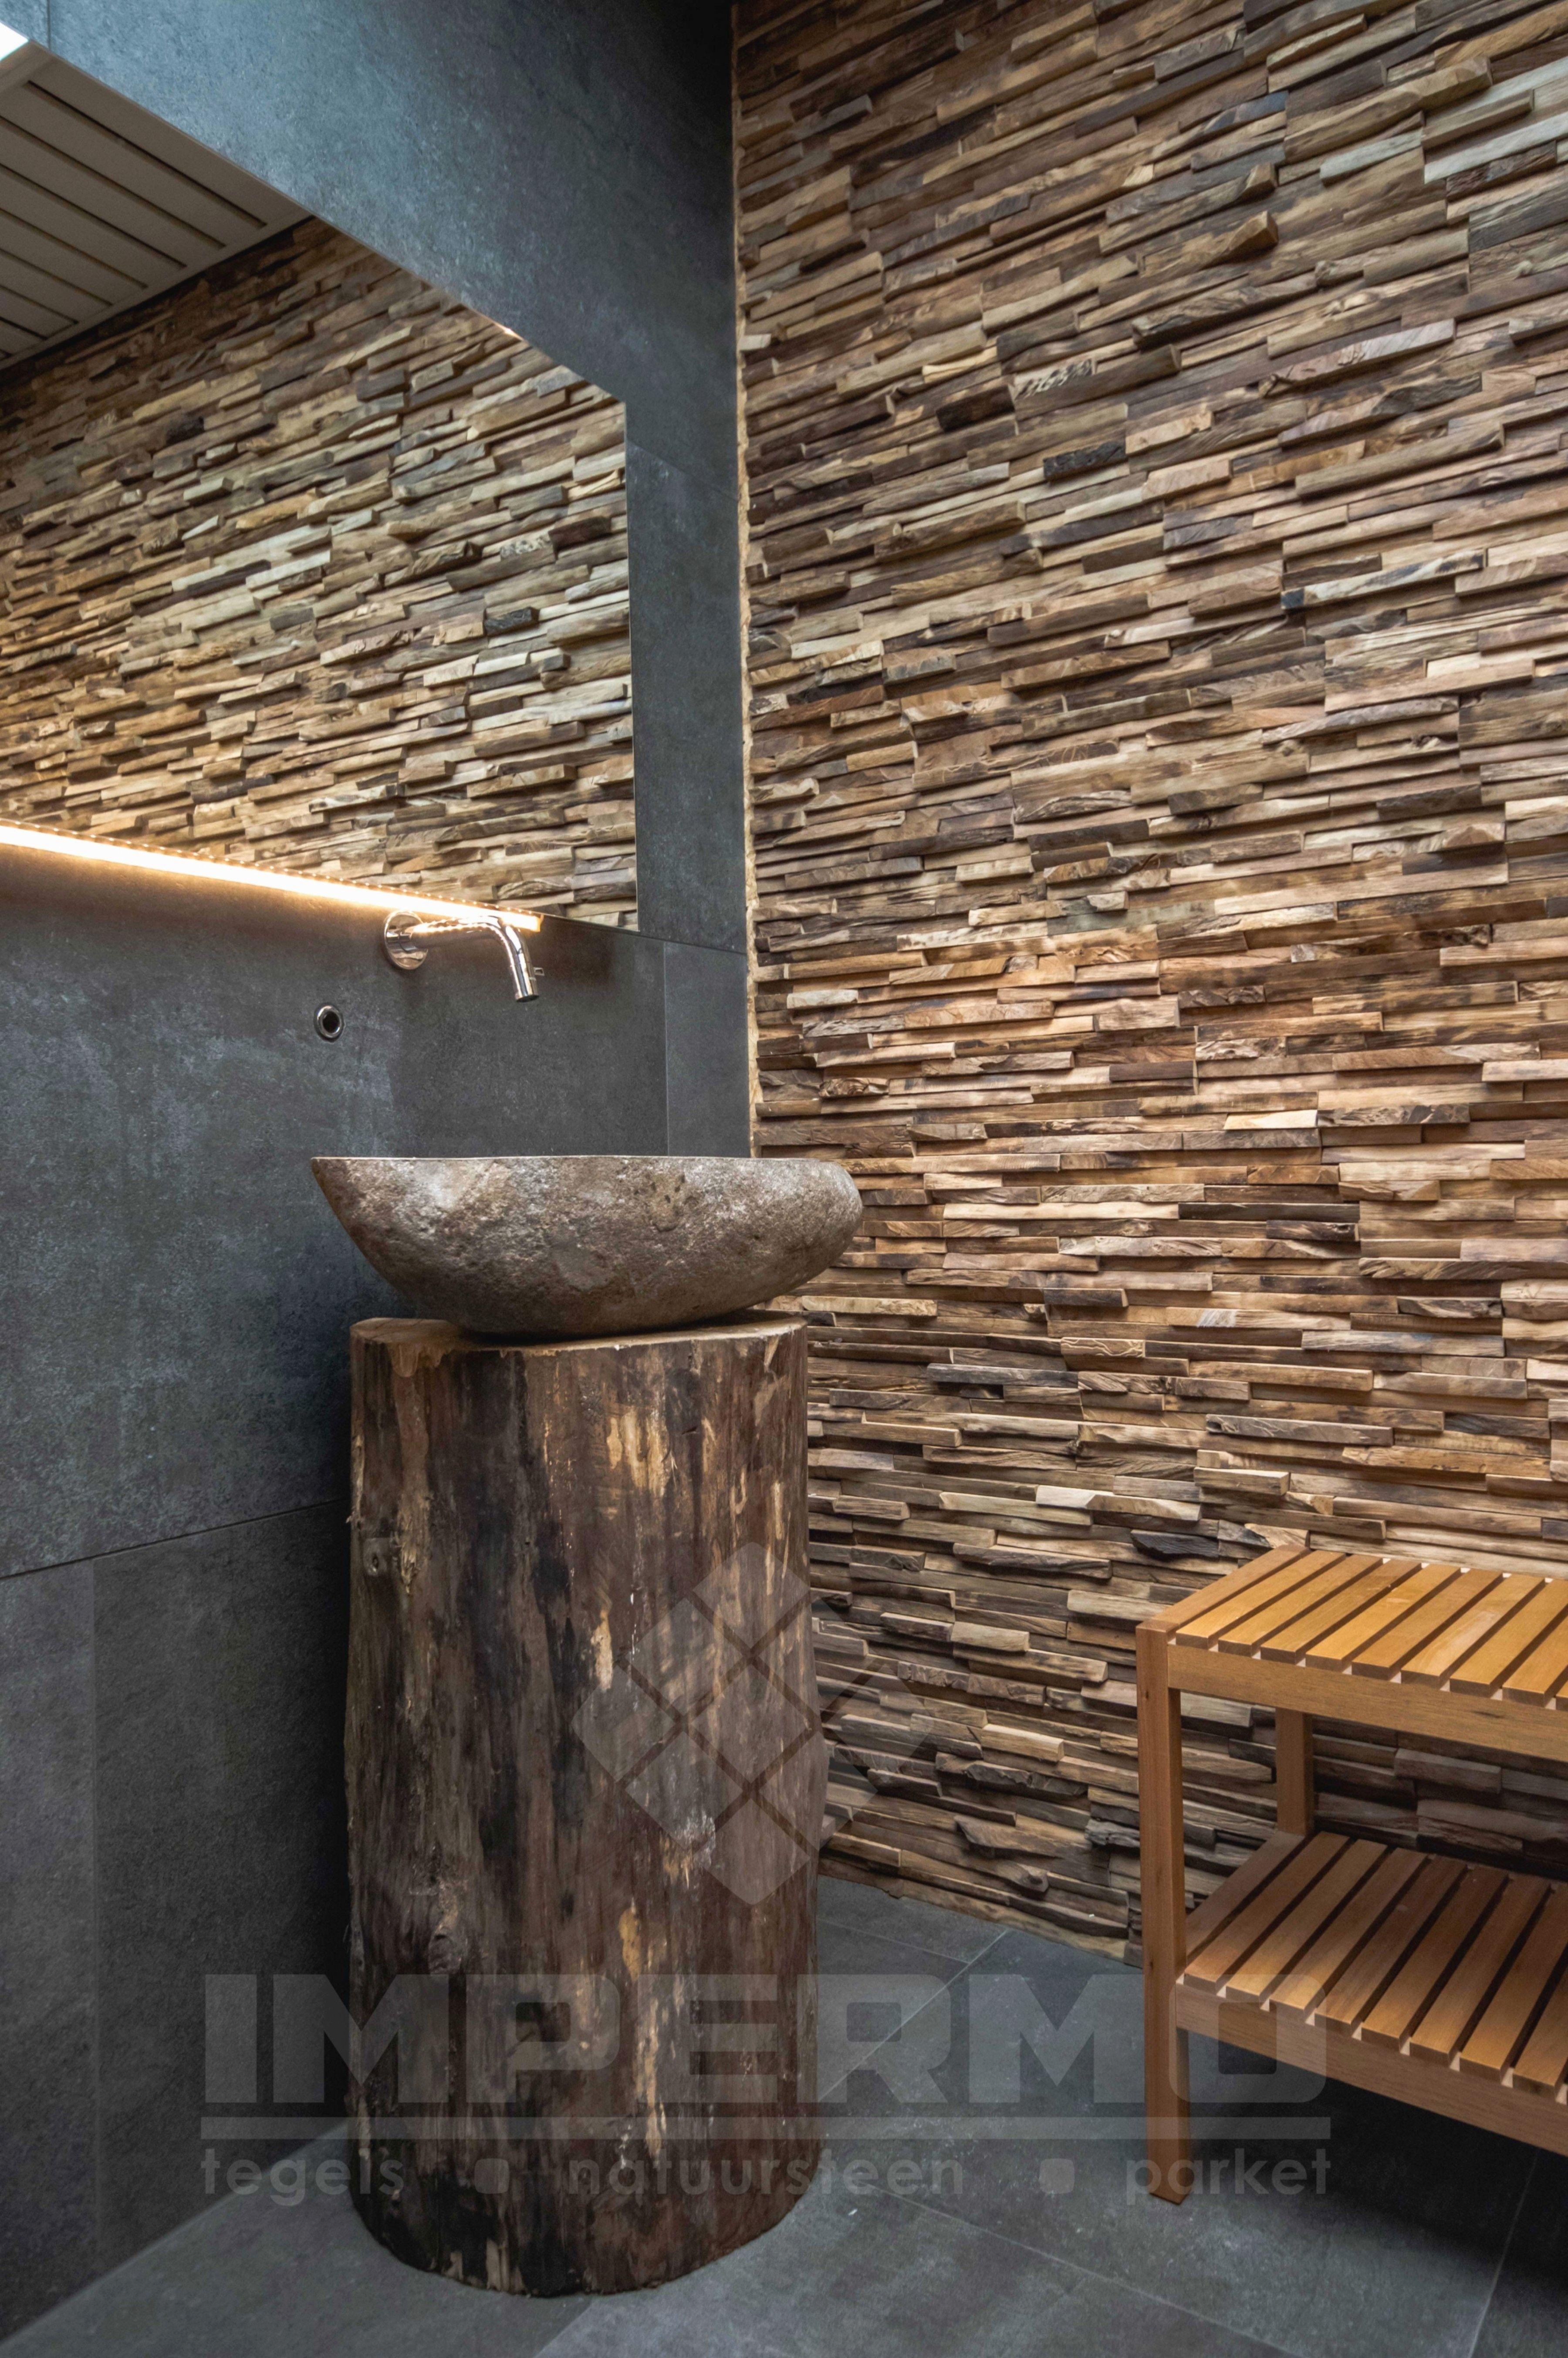 20 Luxe Kunststof Wandpanelen Keuken Badkamer Natuursteen Badkamer Ontwerp Wandbekleding